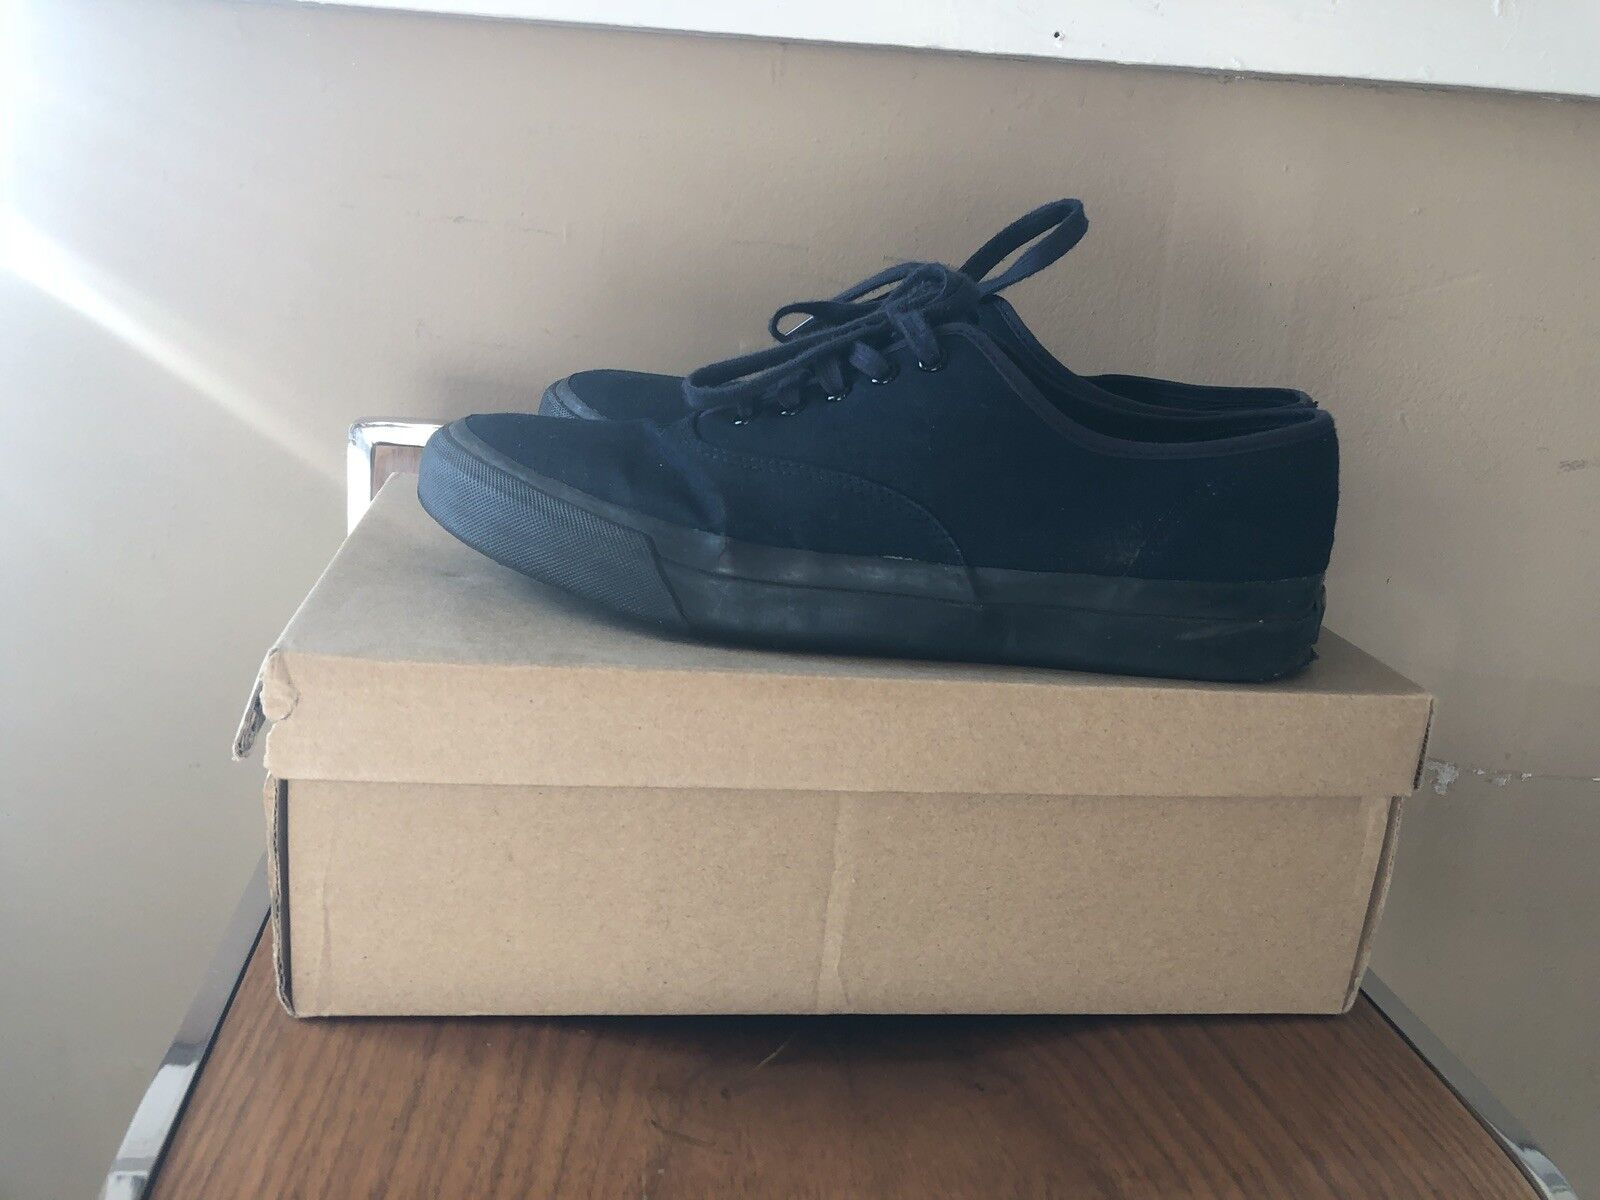 Ralph Lauren Double RL Military Issue Sneakers Sz 9